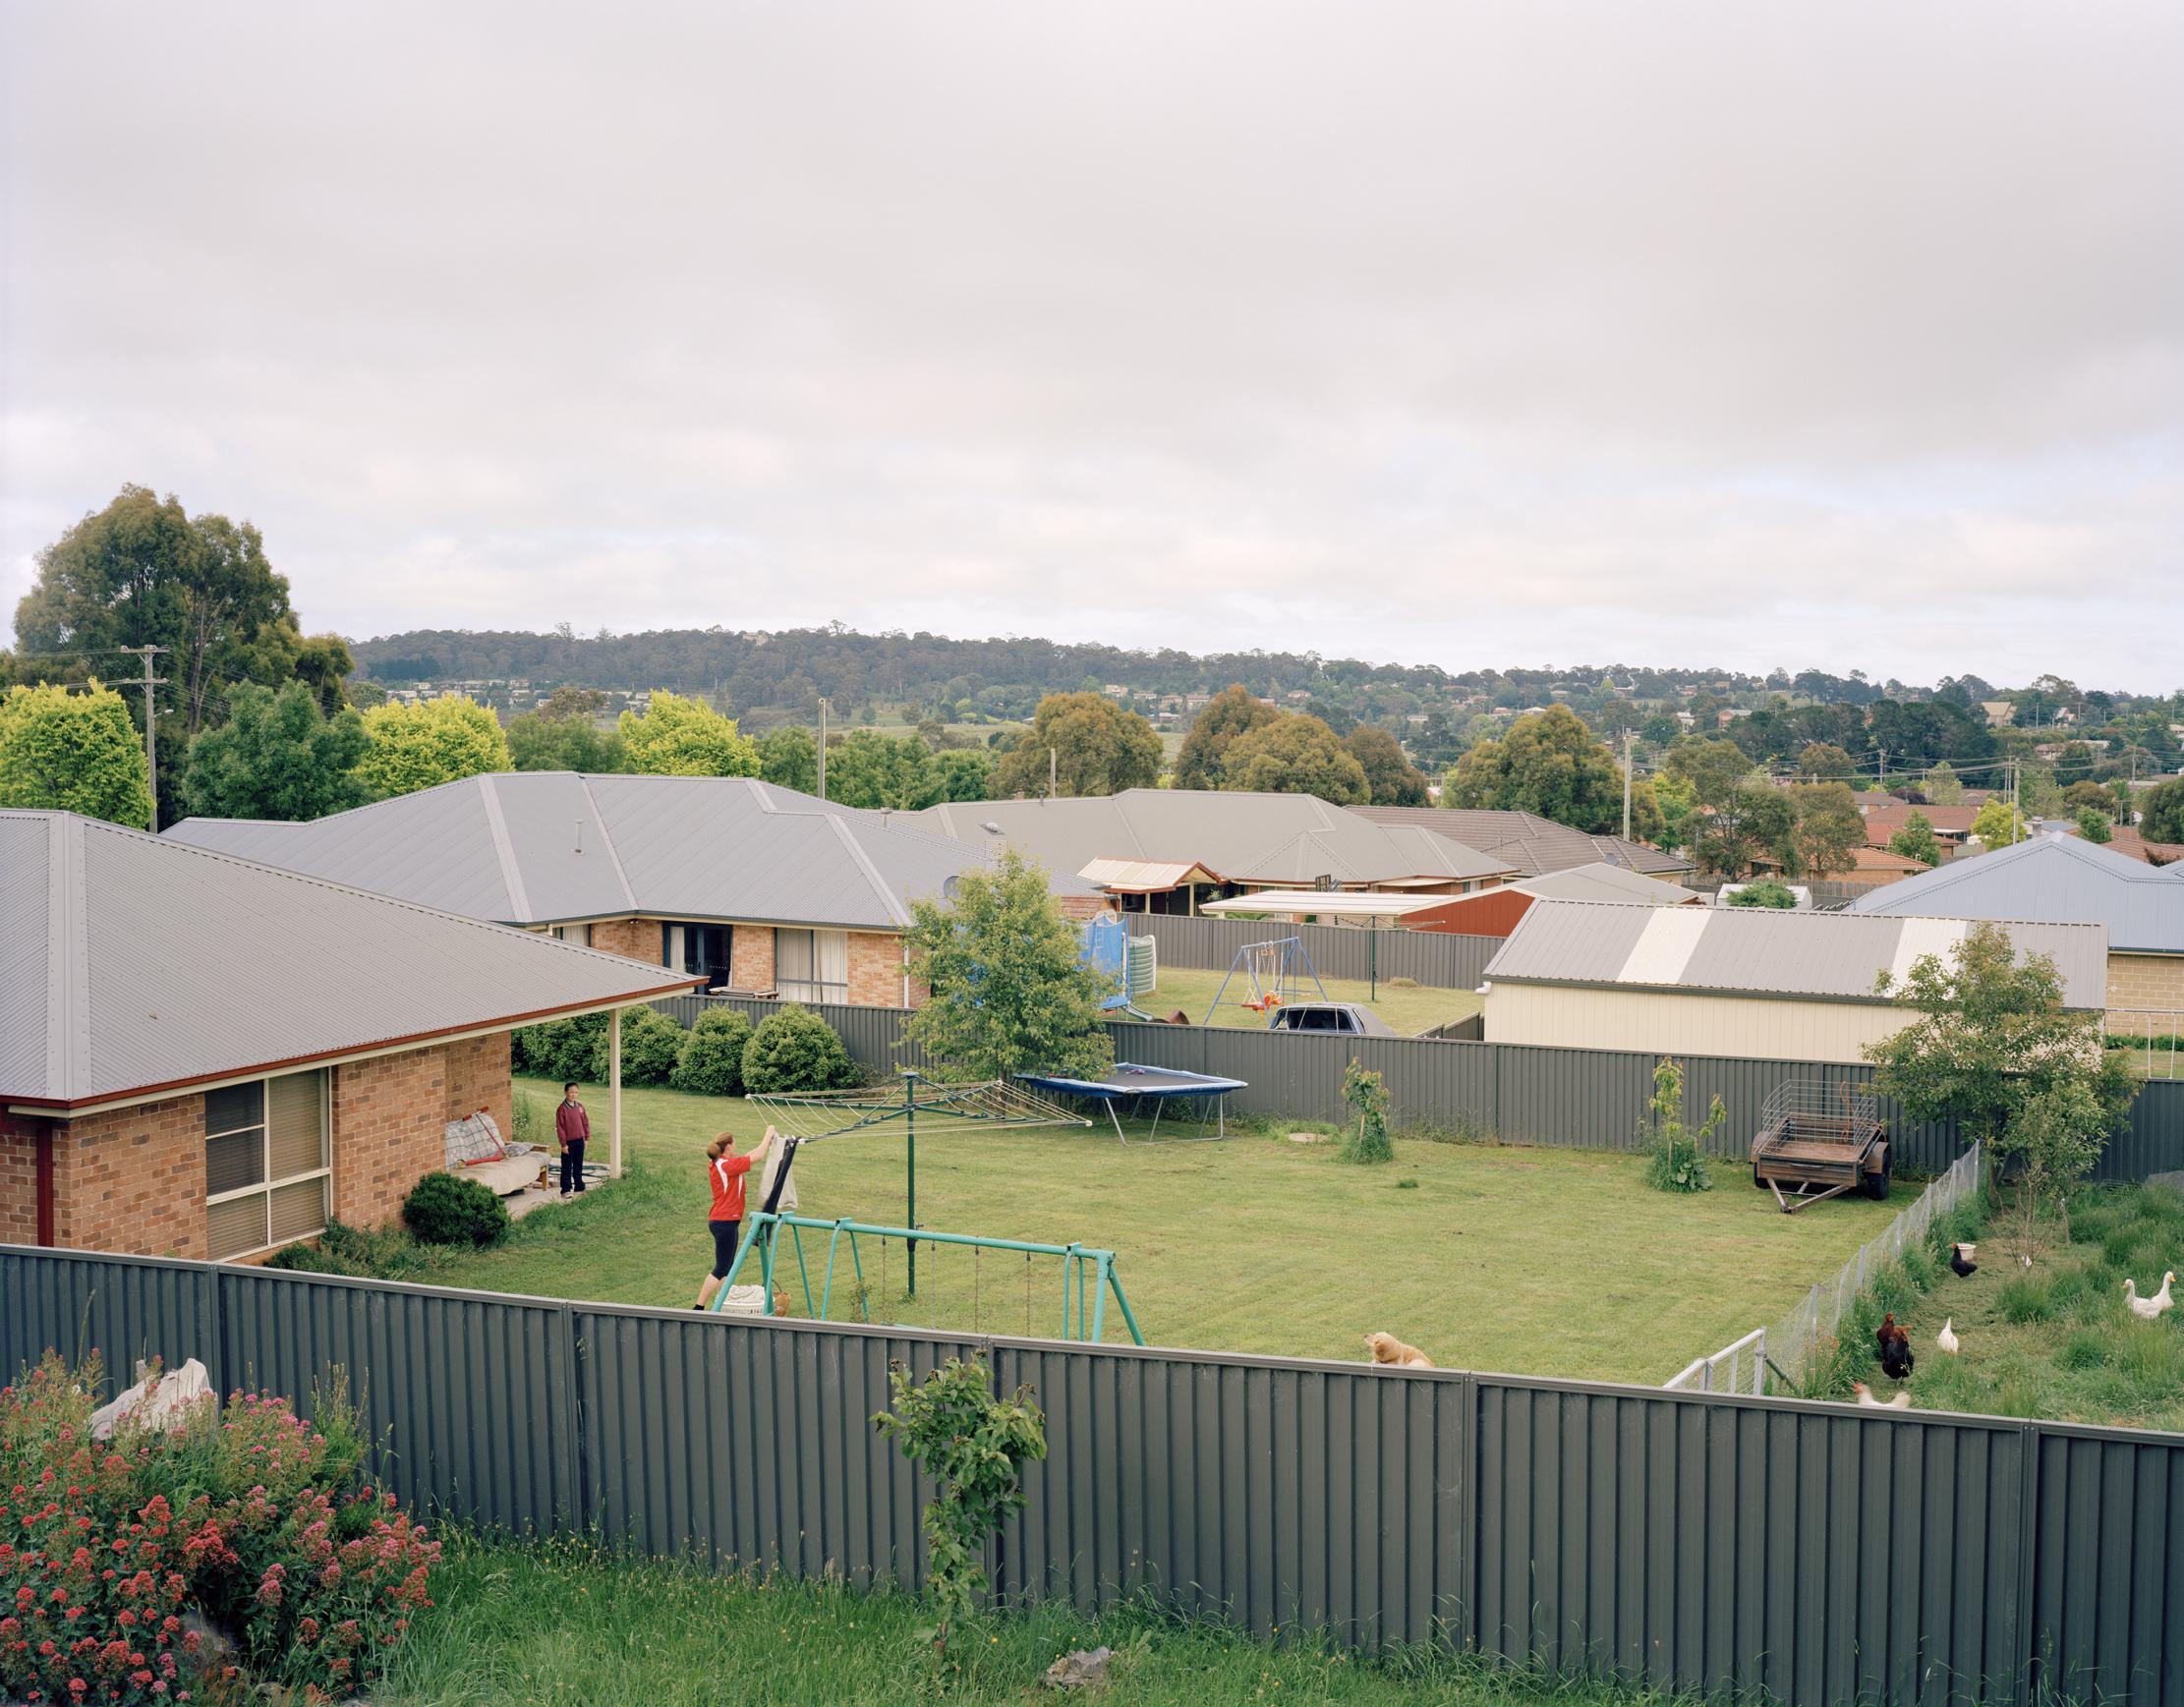 Oberon, Australia